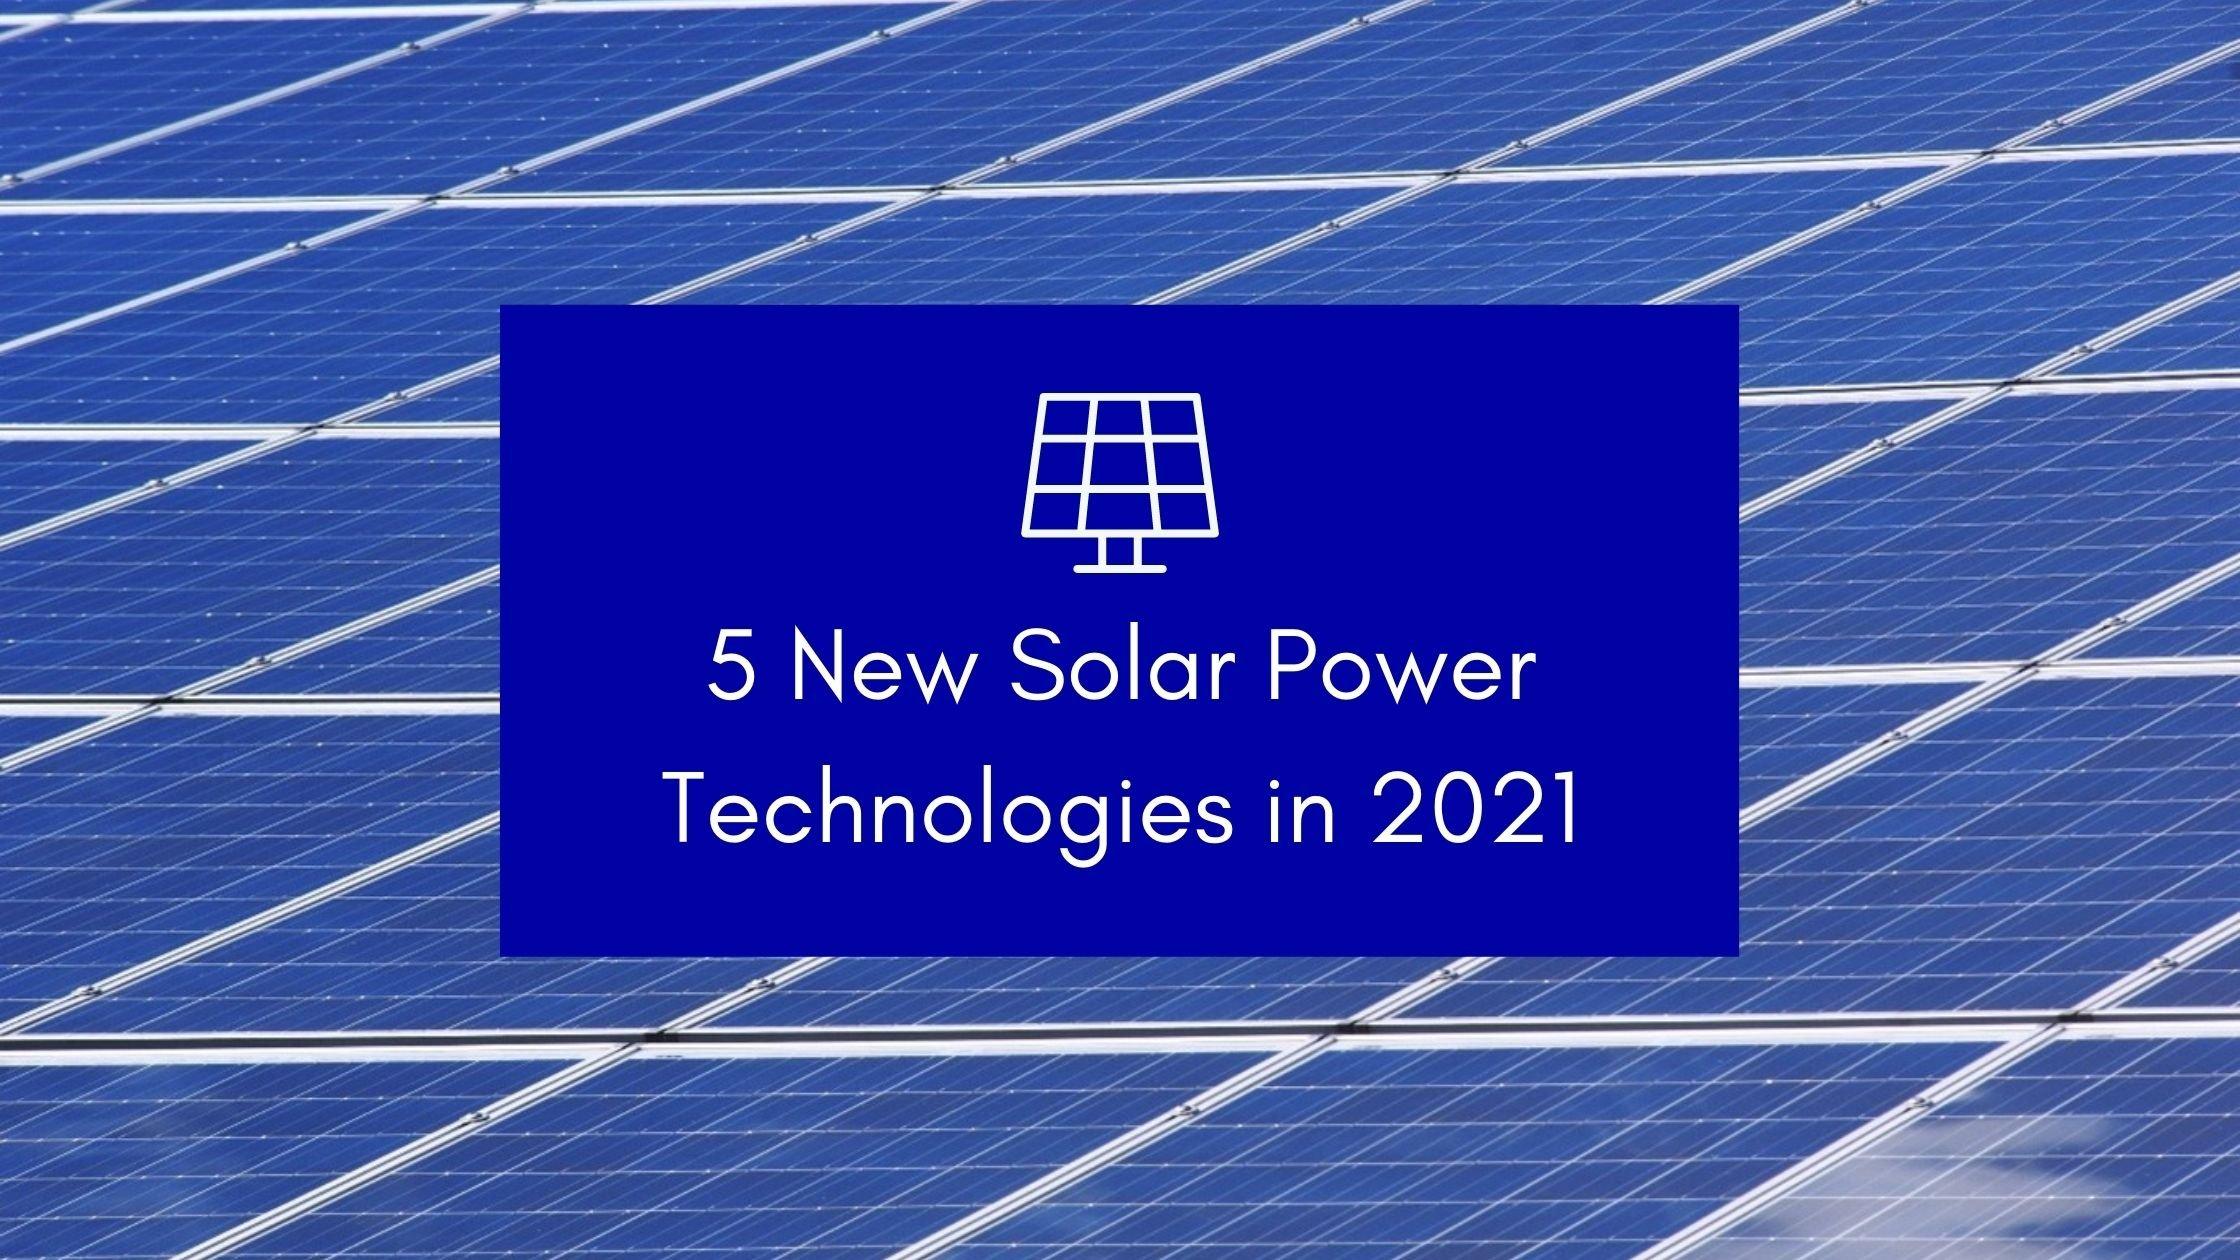 New Solar Power Technologies in 2021